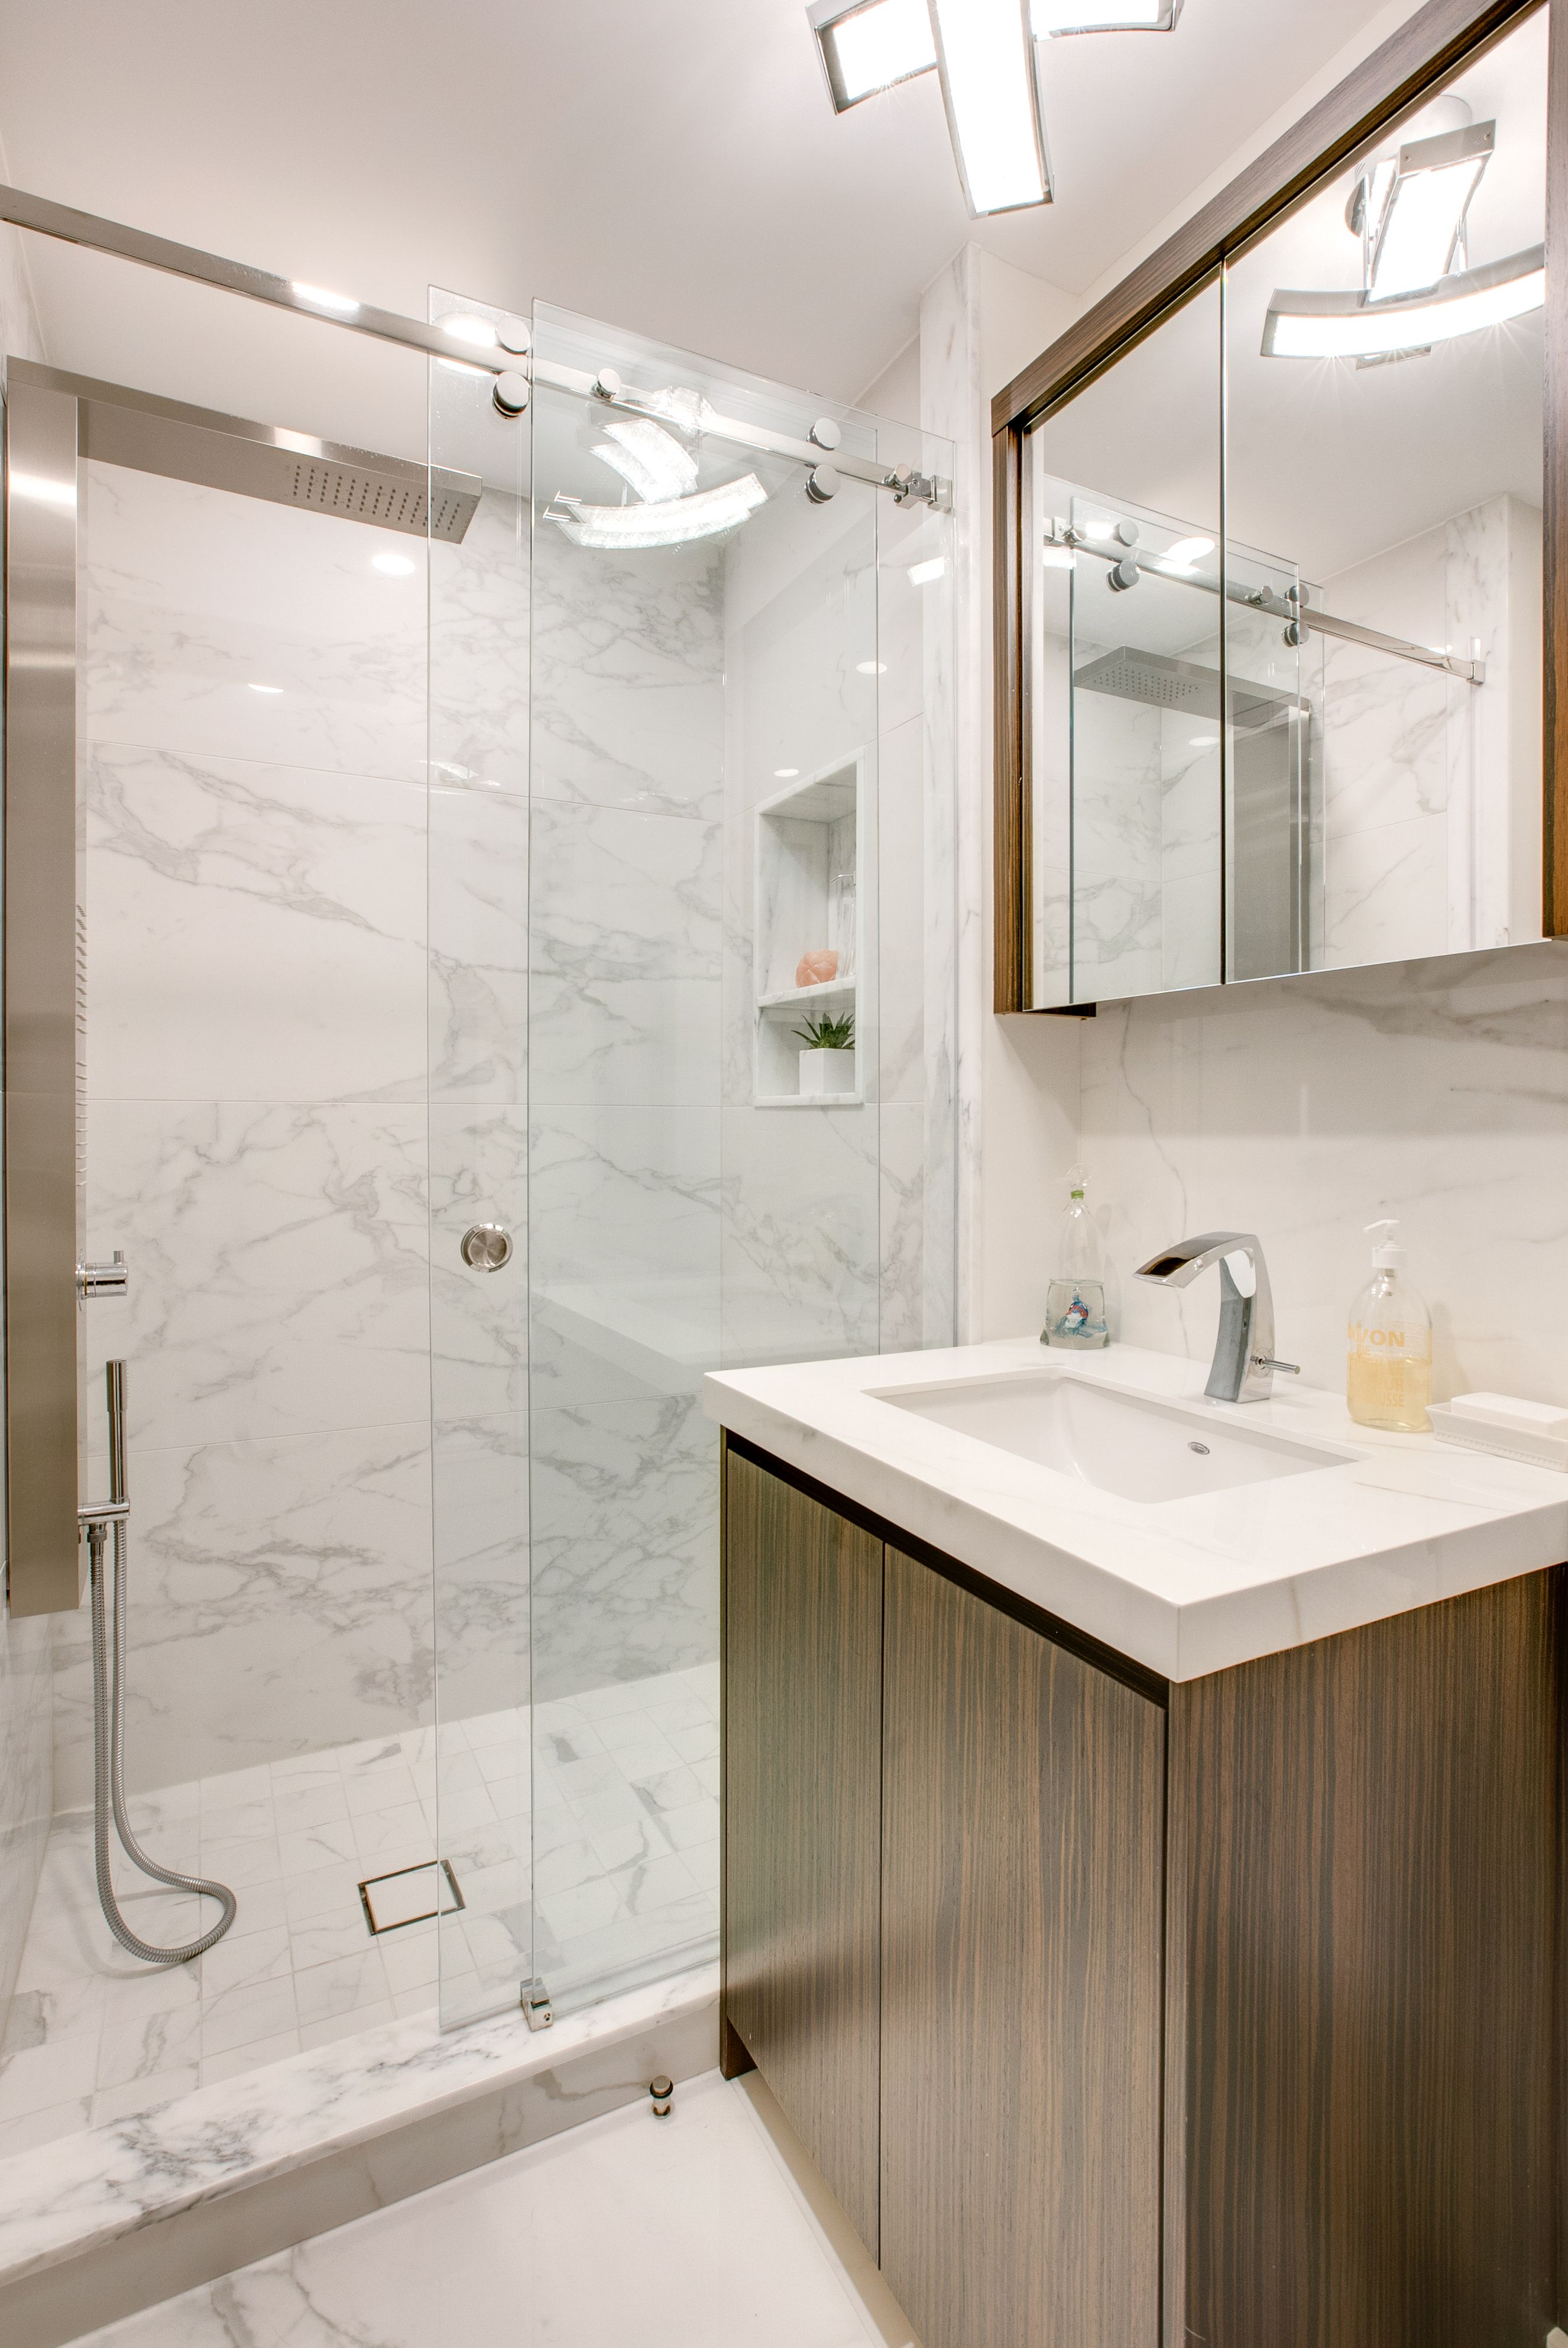 Graff Sento 8 Faucet Aquamassage Shower Systems And Dxv Sink Bathroom Interior Design Bathroom Shower Panels Elegant Bathroom